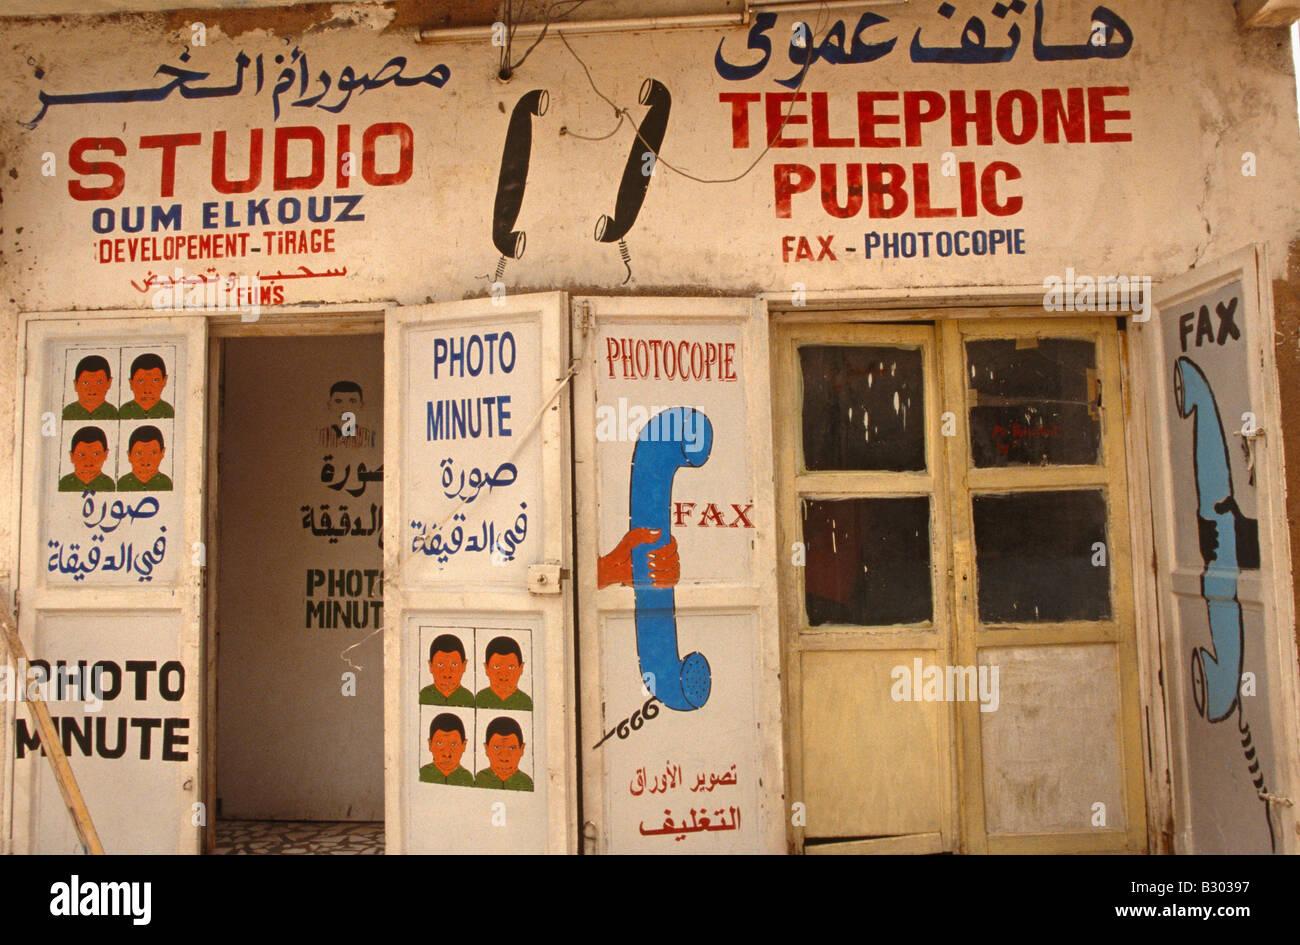 A photo studio in Mauritania. - Stock Image